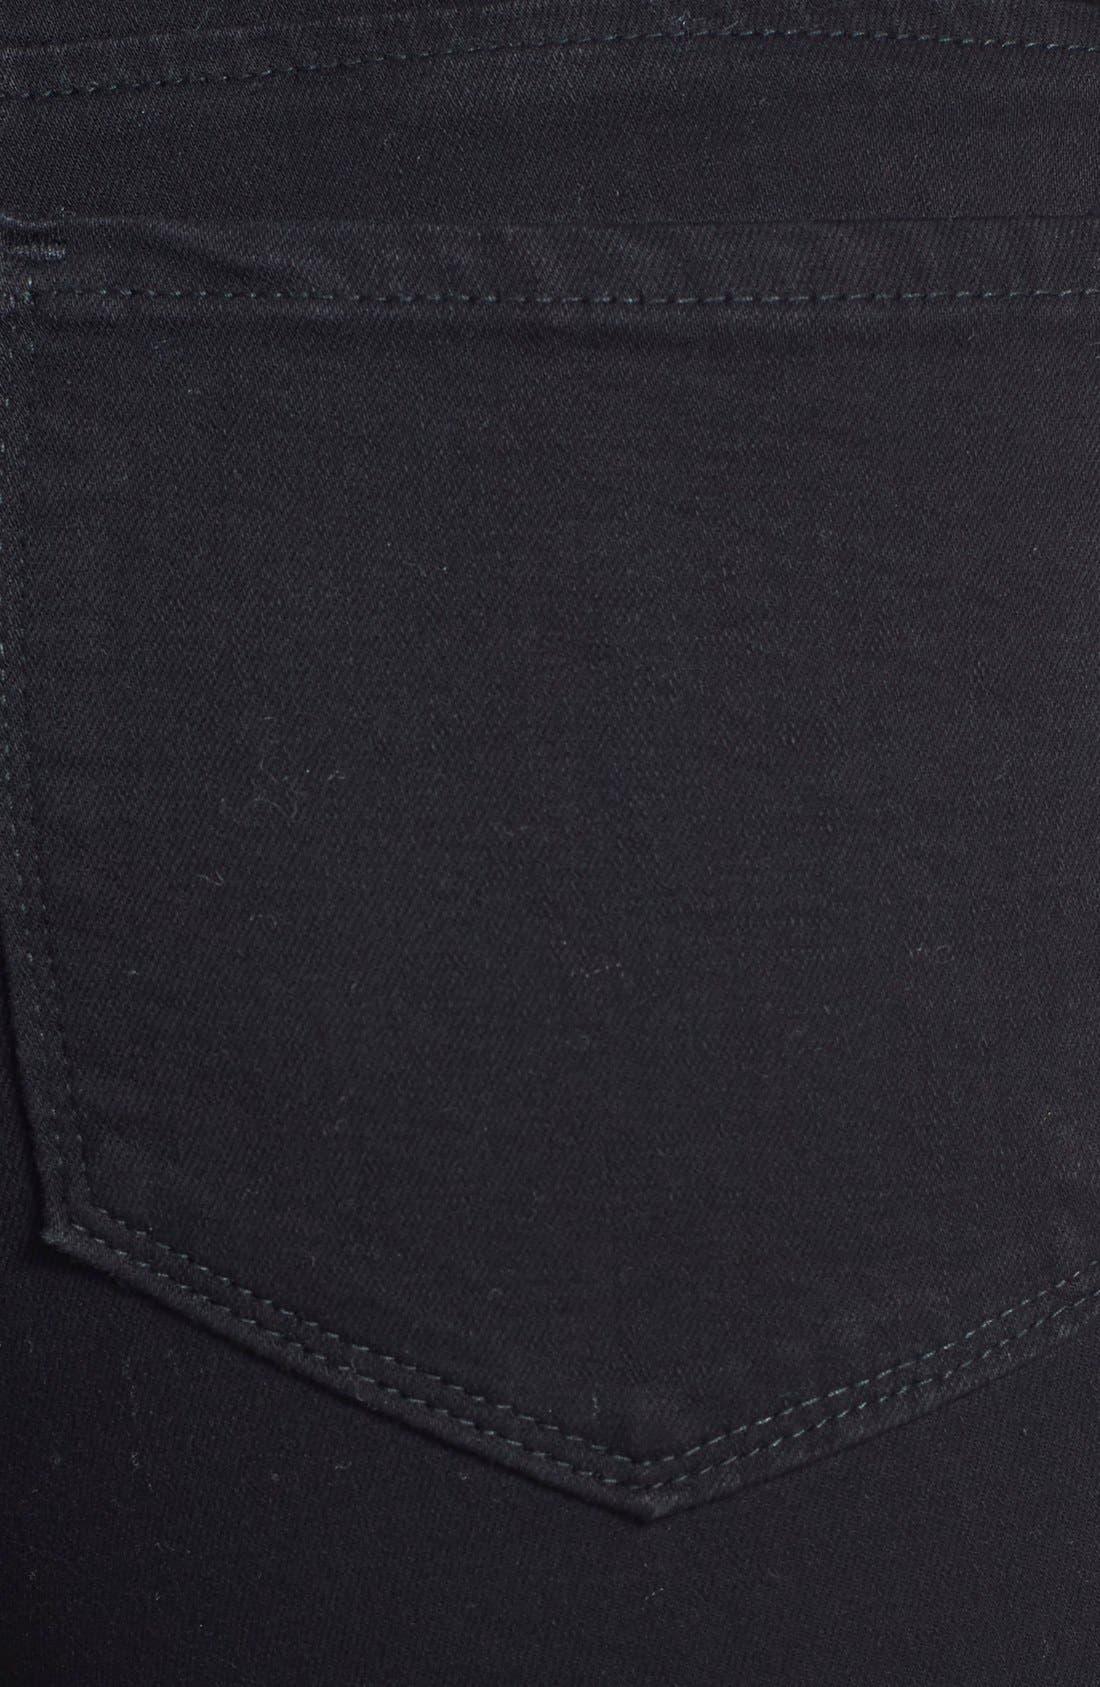 Alternate Image 3  - NYDJ Alina Stretch Ankle Jeans (Black) (Regular & Petite)